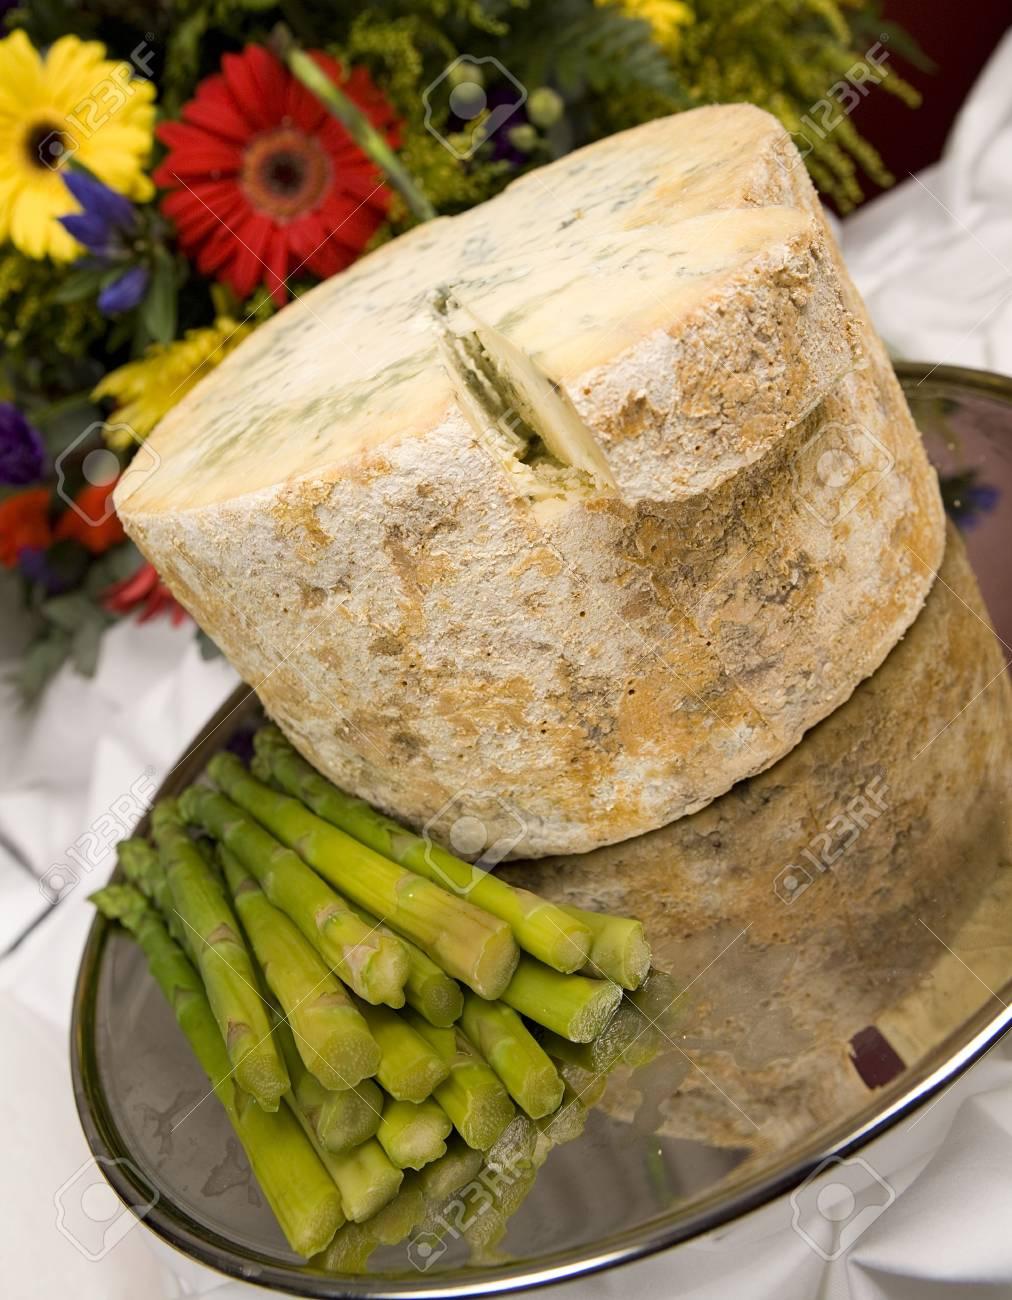 A whole Stilton cheese with asparagus spears. Stock Photo - 6080986